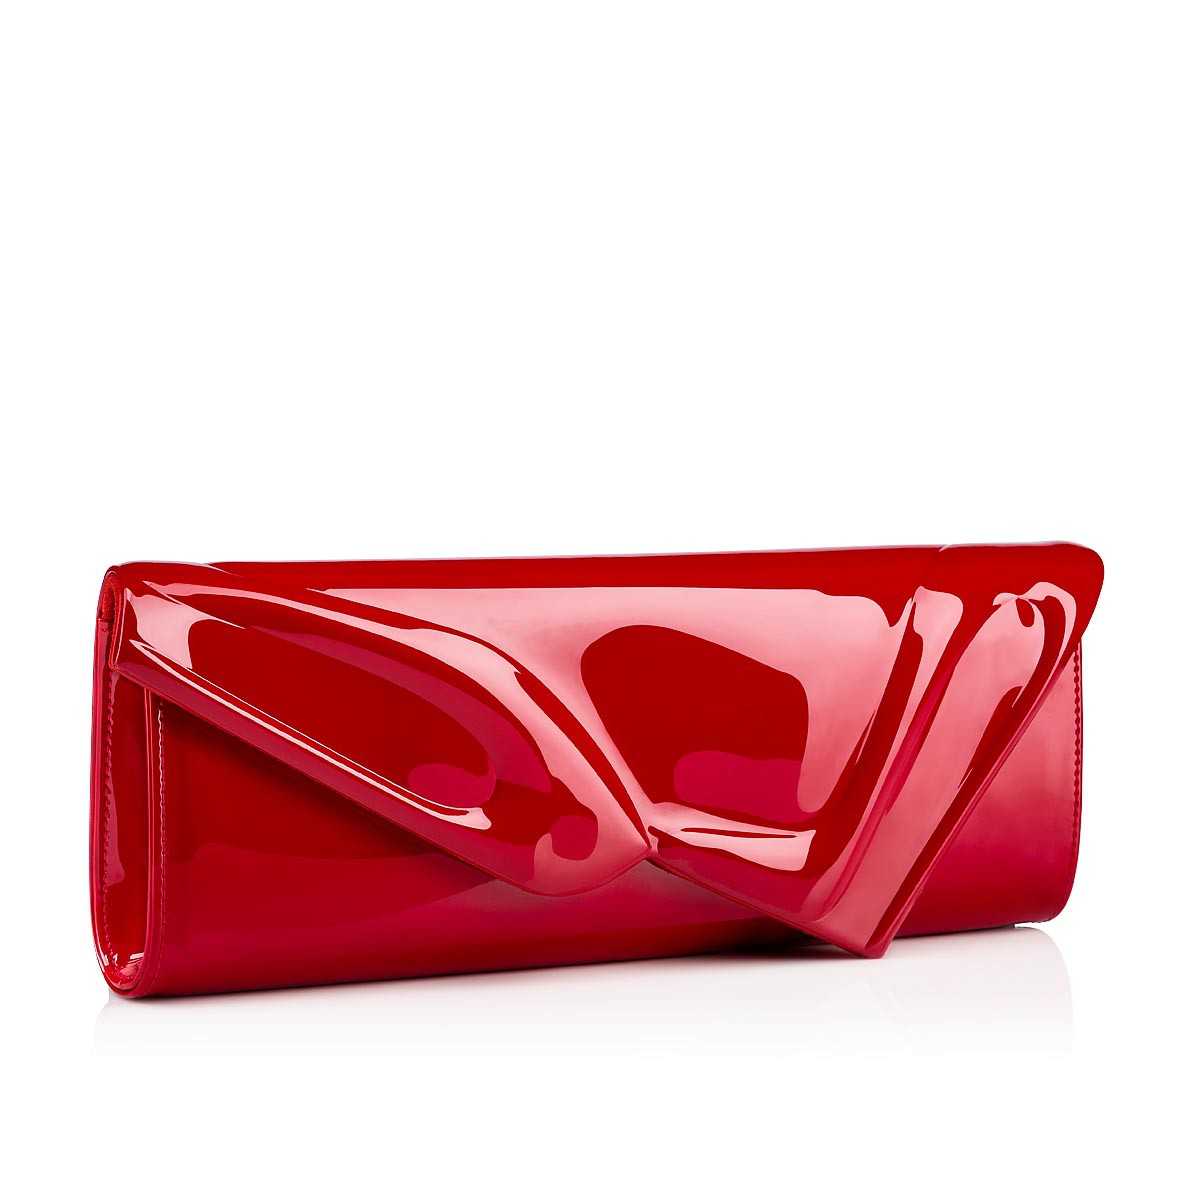 Bags - Pochette So Kate - Christian Louboutin